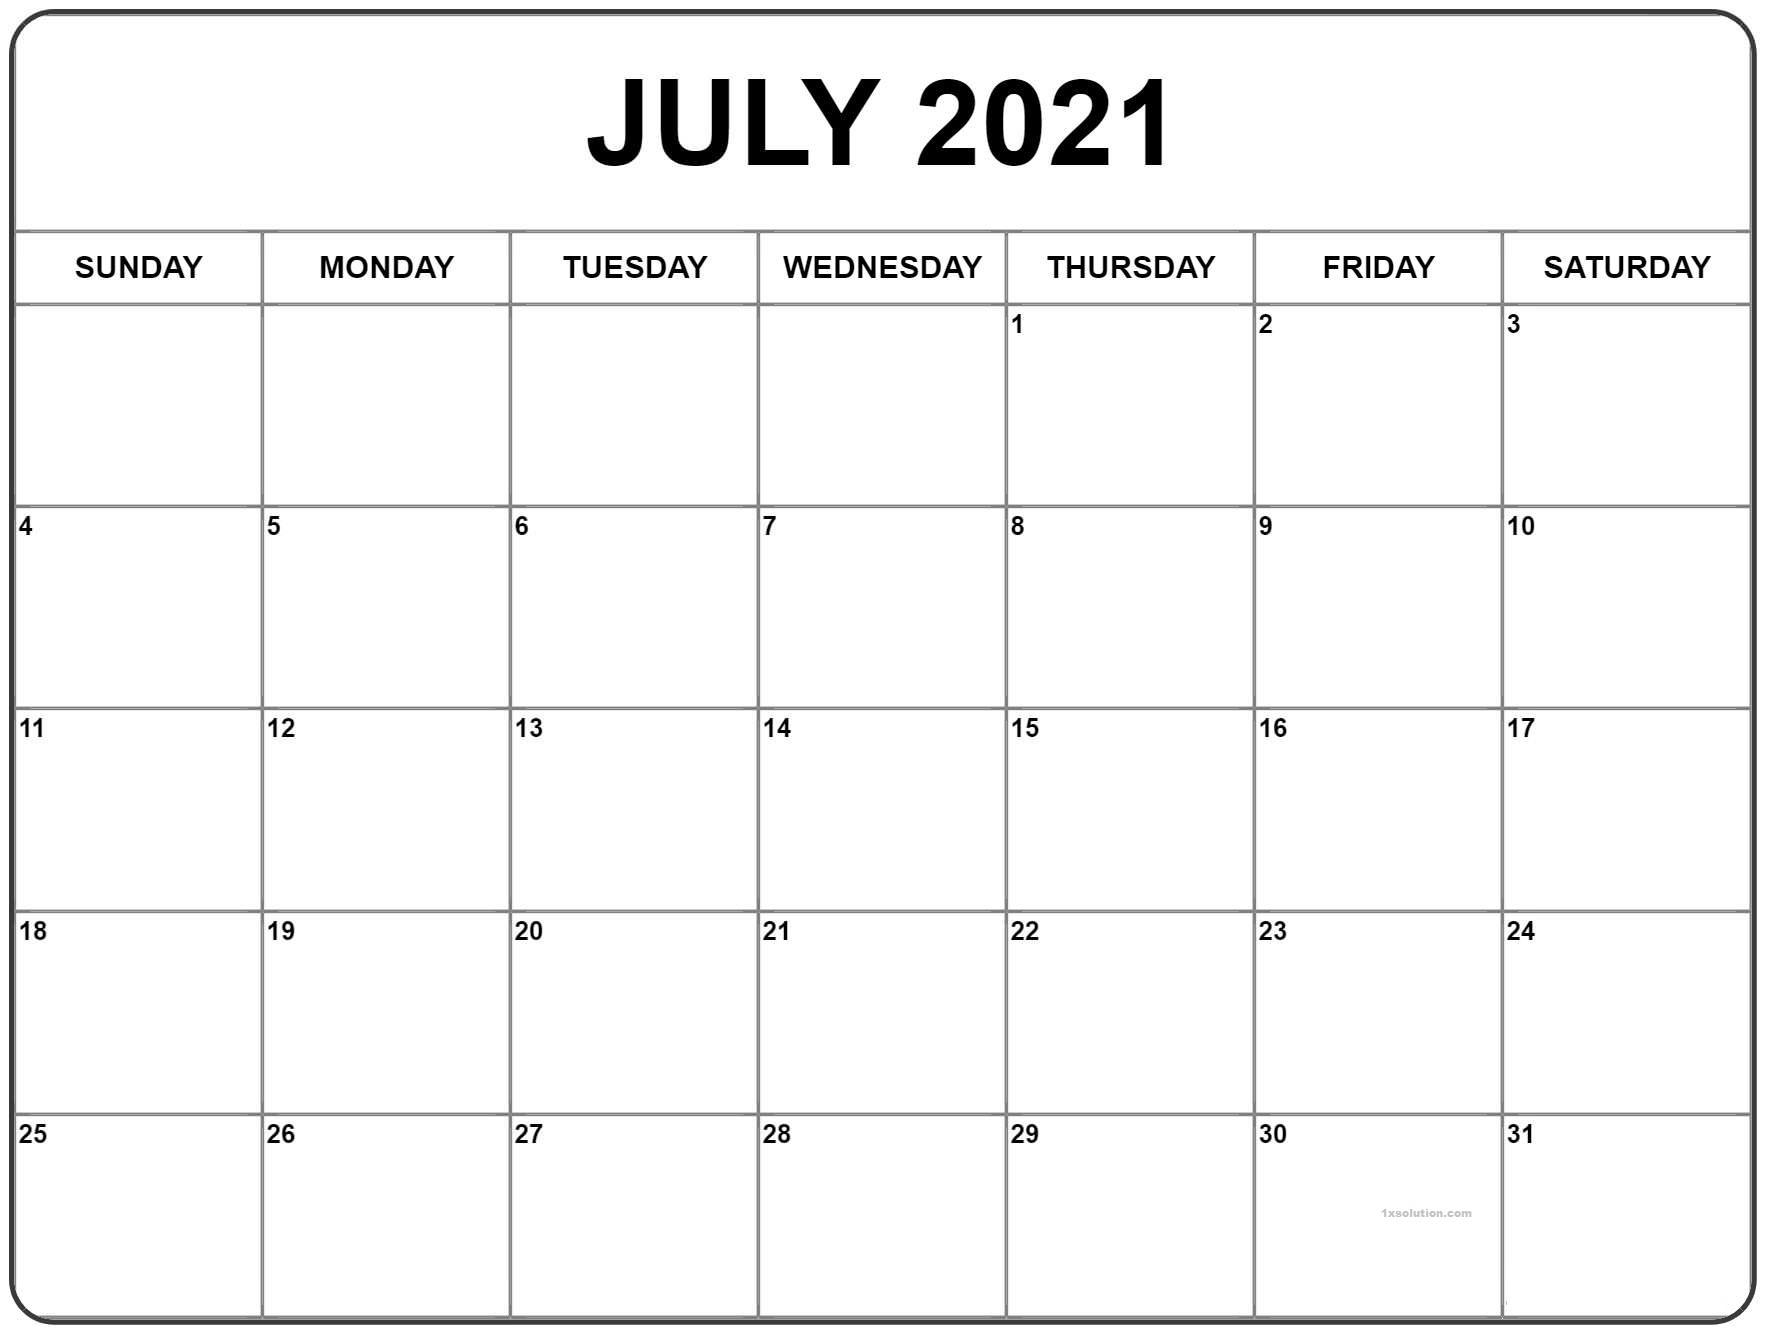 July 2021 Calendar Blank